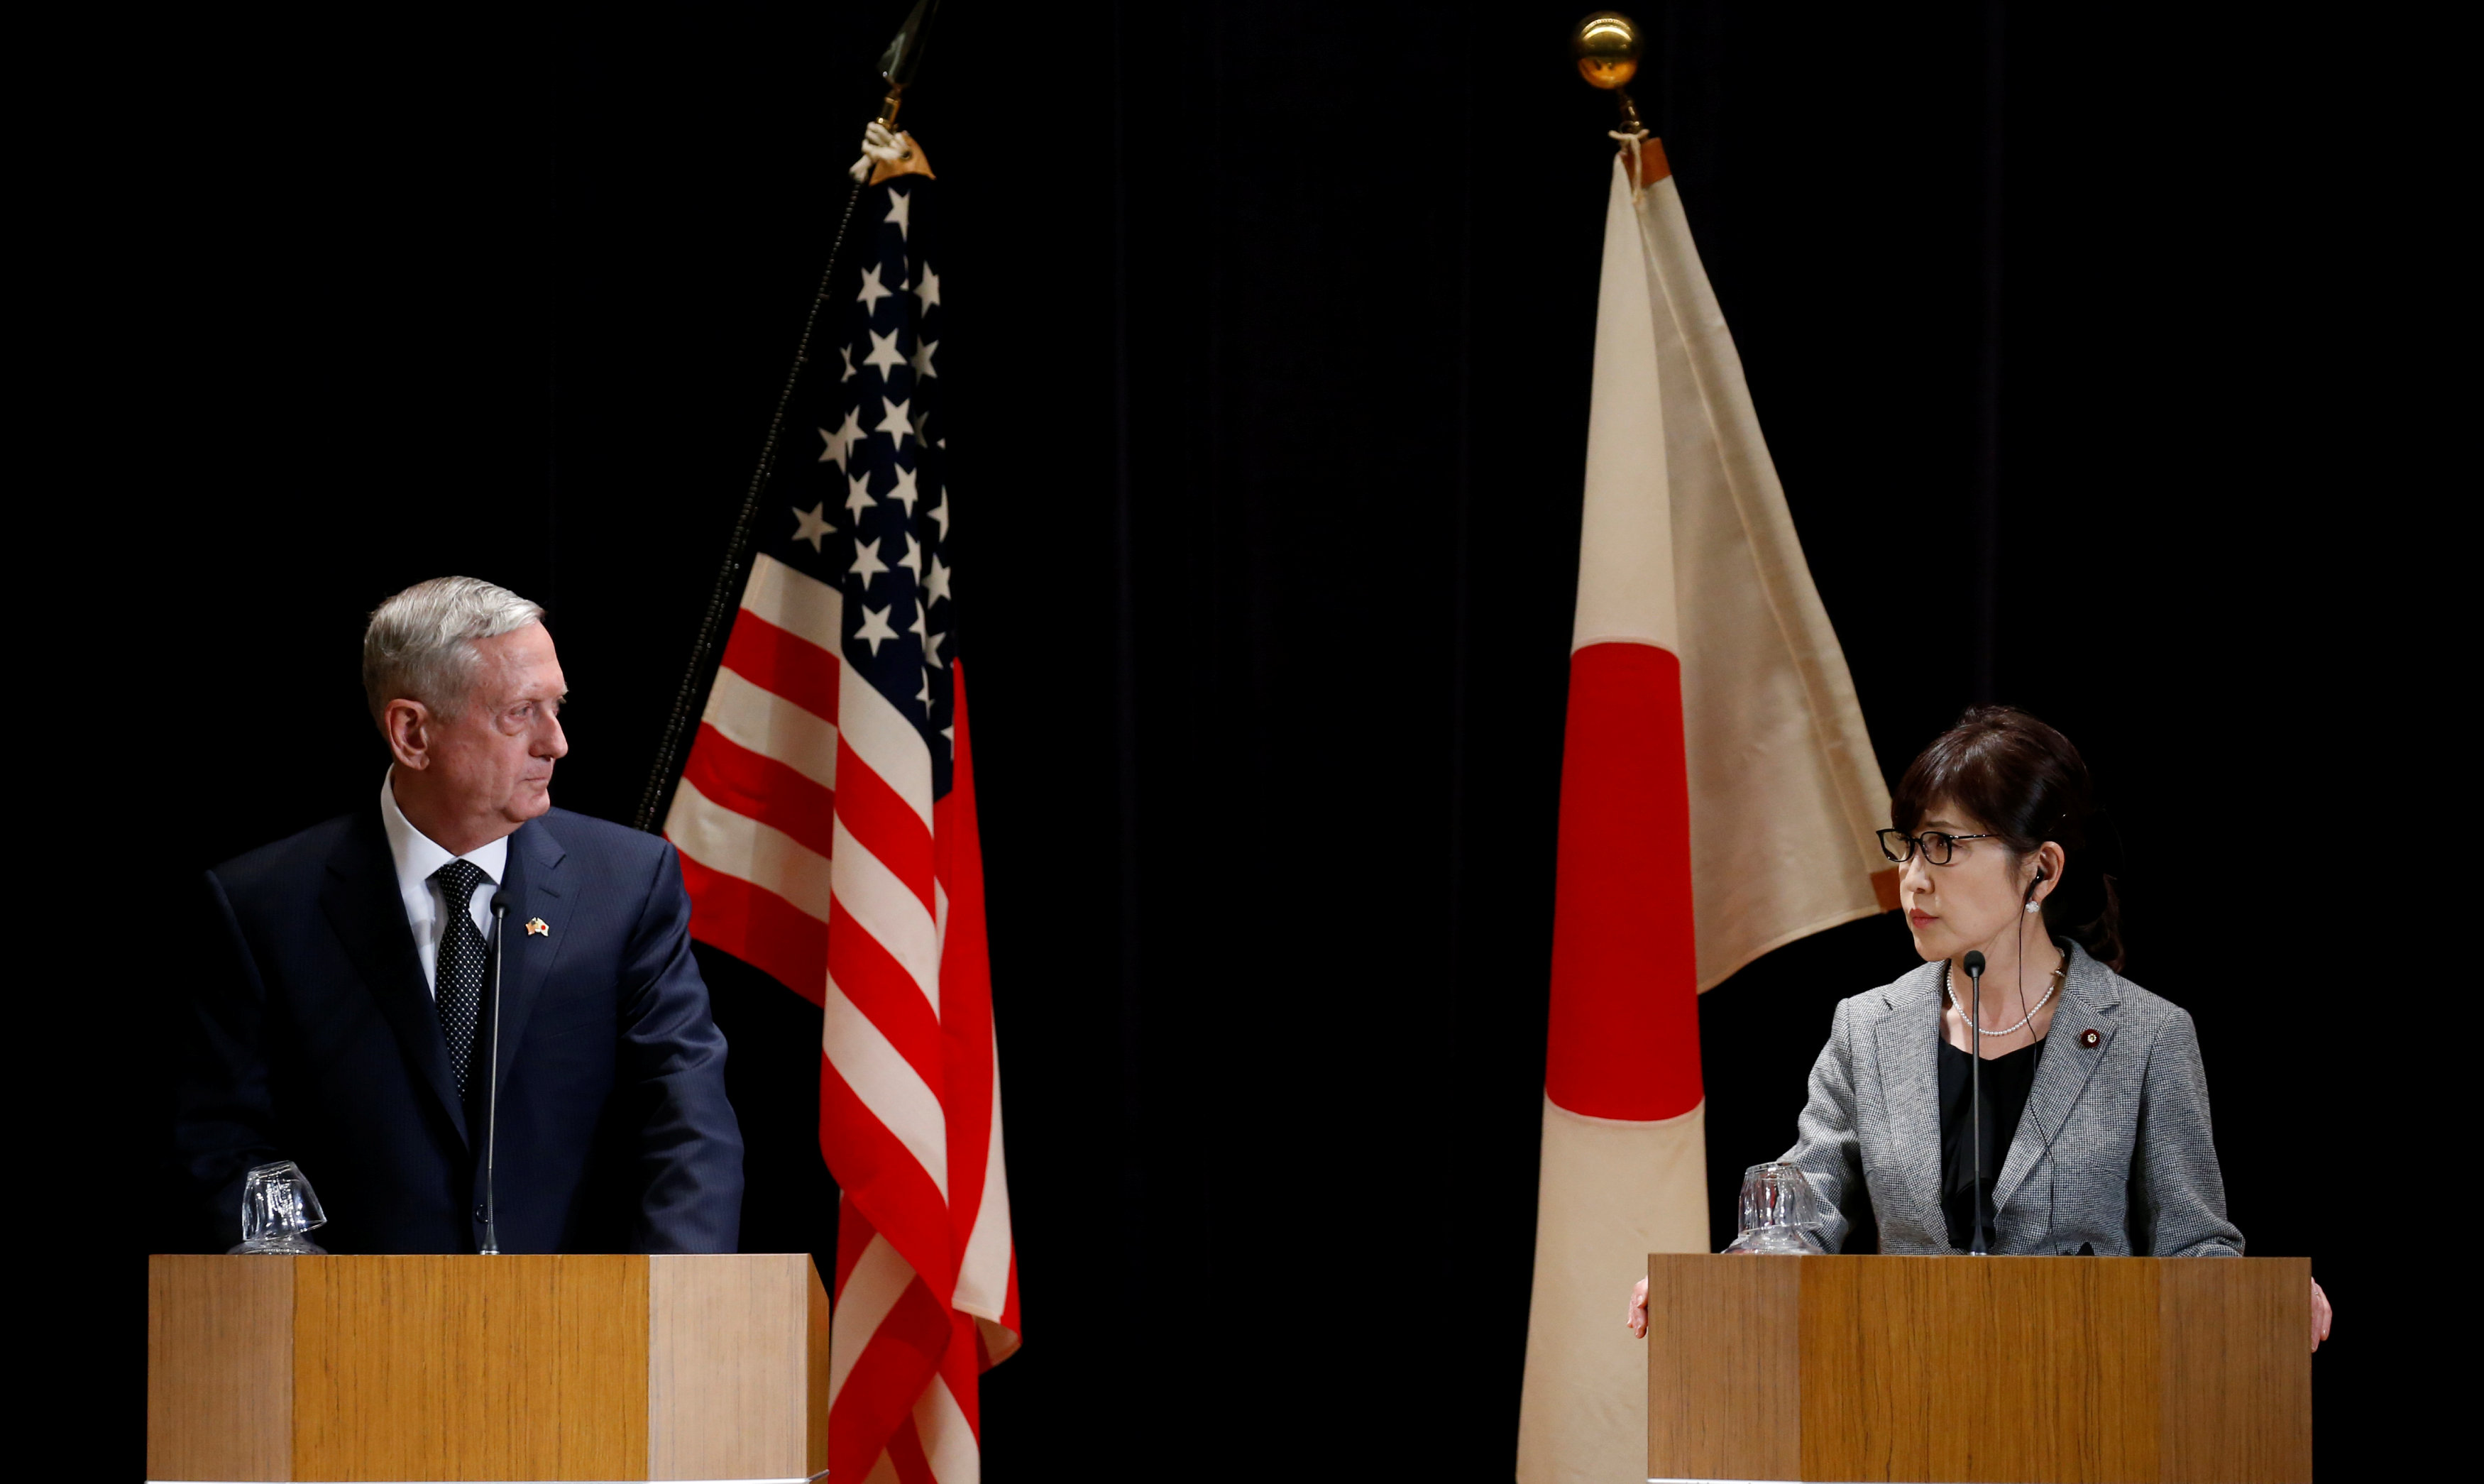 Mattis reaffirms US alliance with Japan